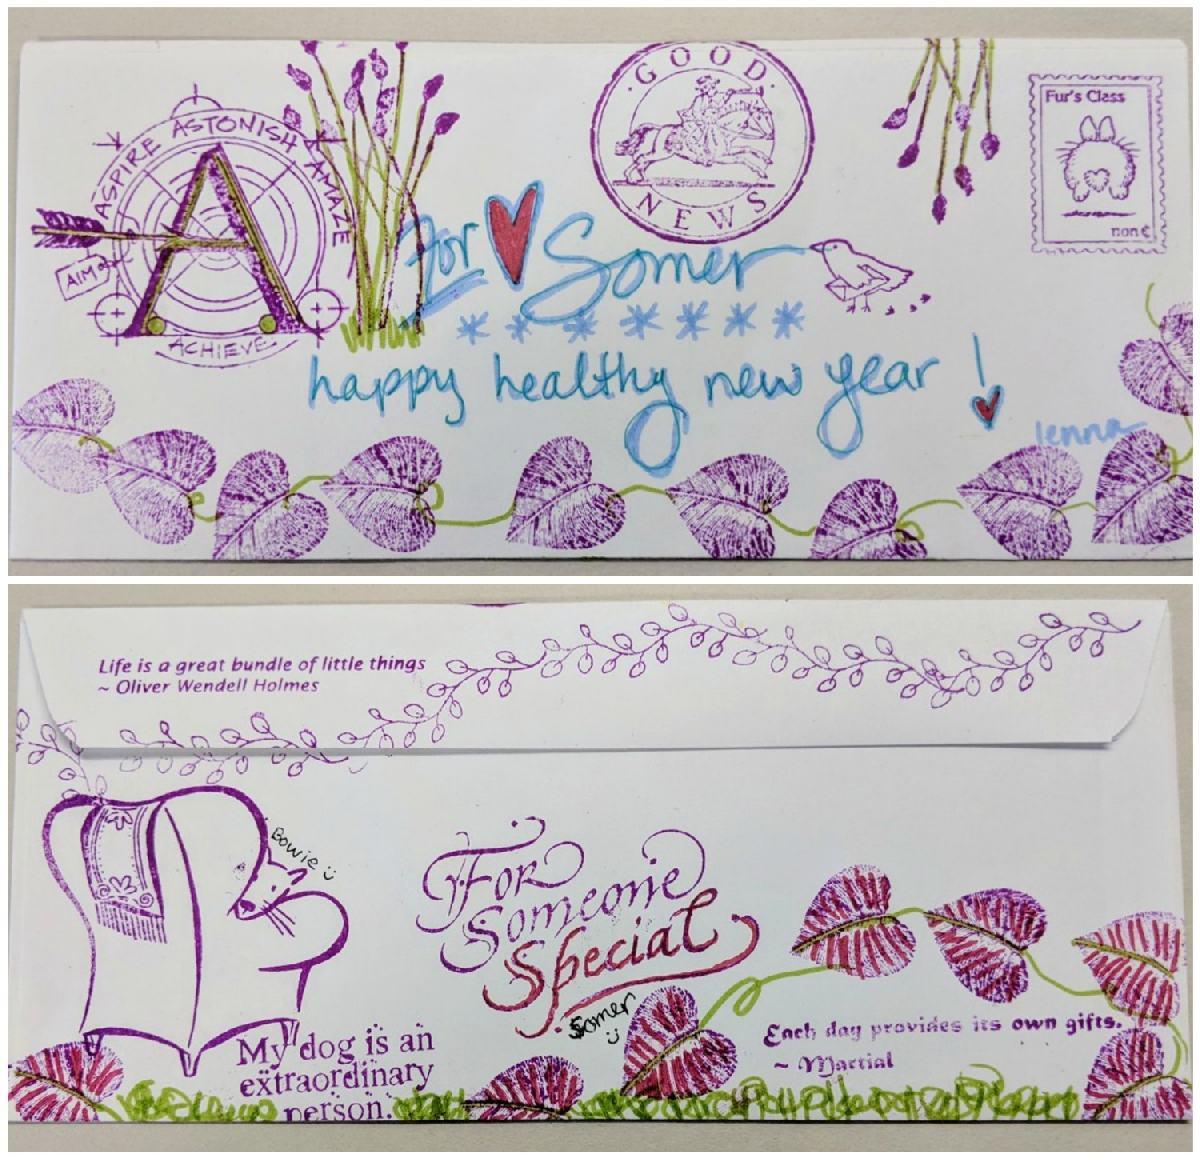 08: mail art